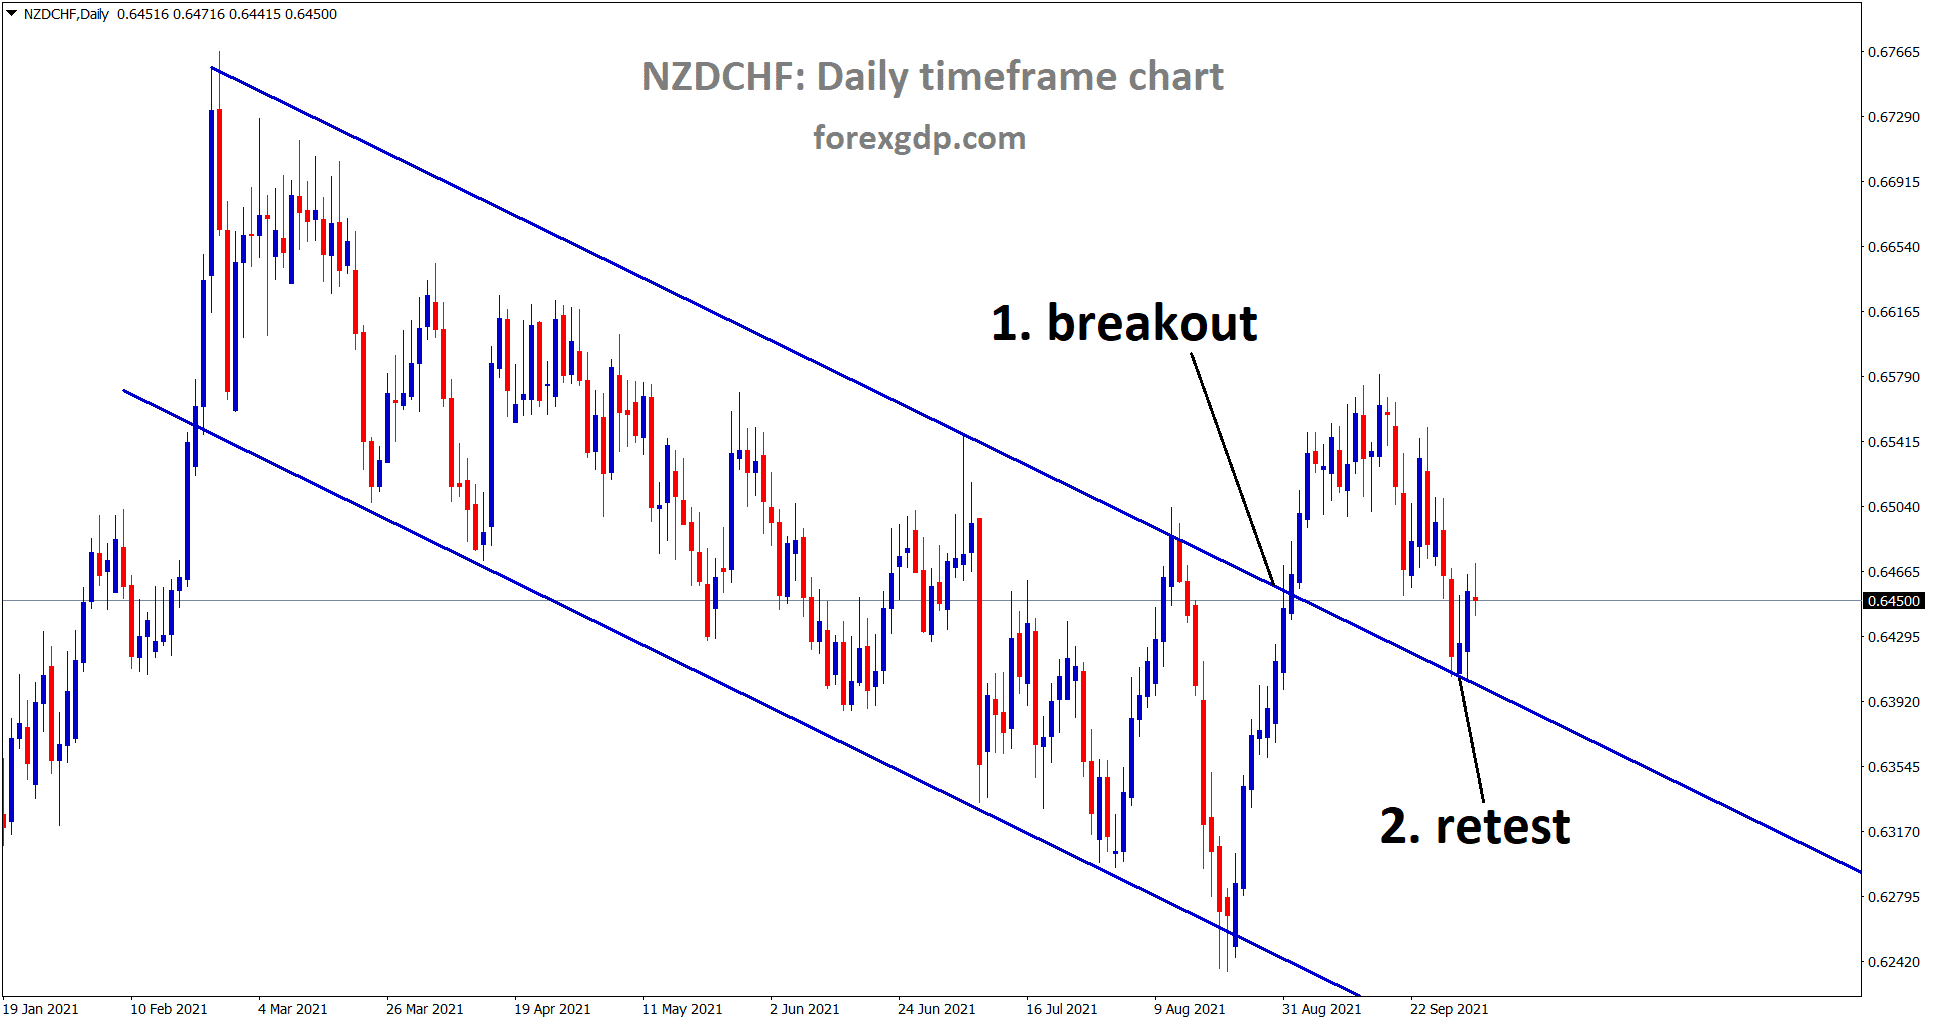 NZDCHF rebounded after retesting the broken descending channel